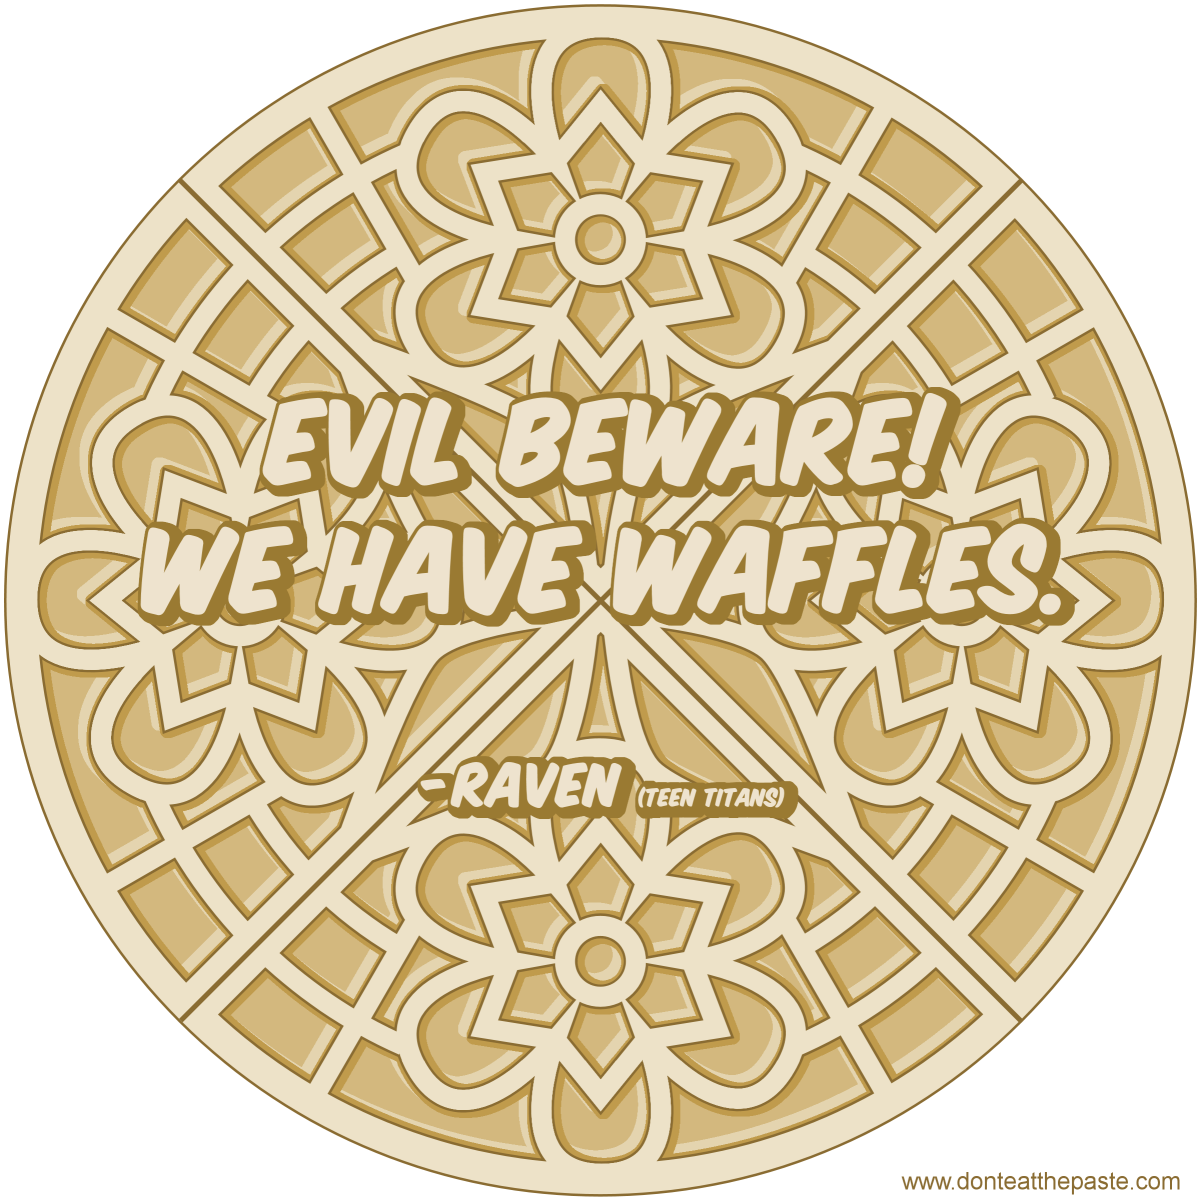 Evil beware- we have waffles.